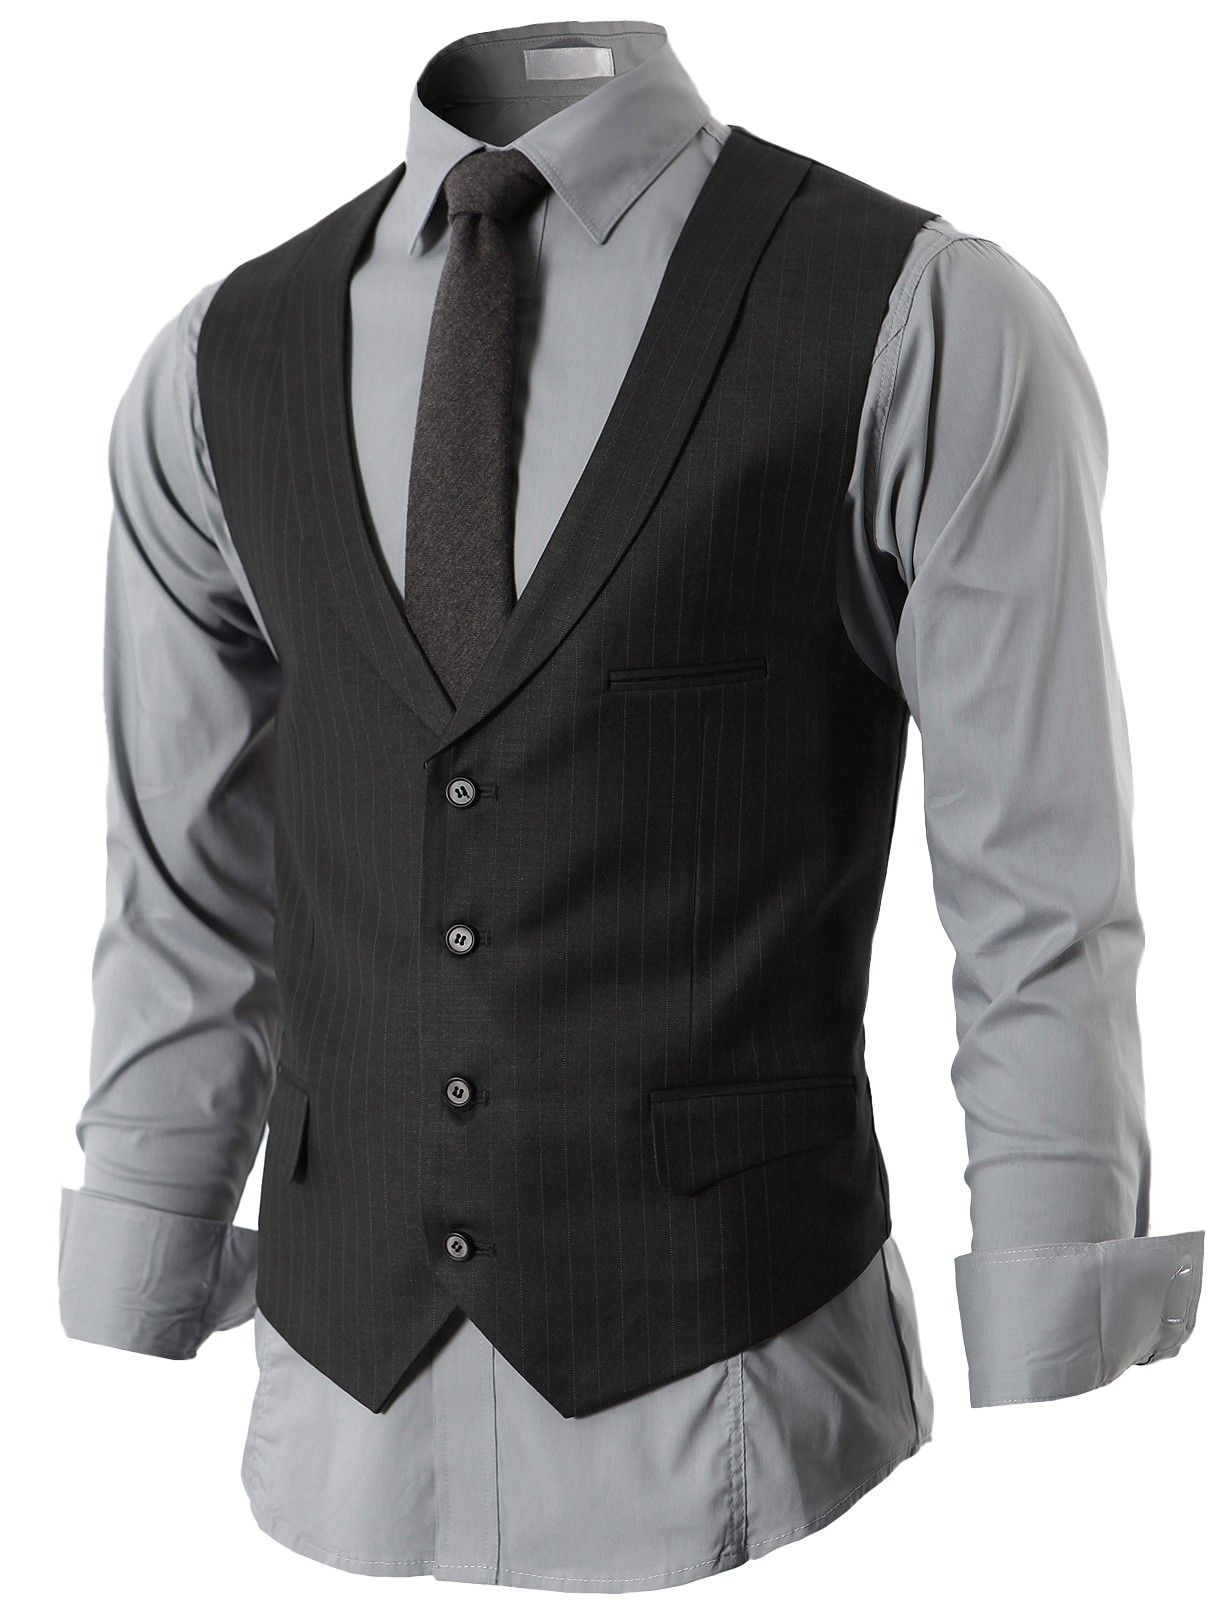 Mens Sleeveless Collared Shirt